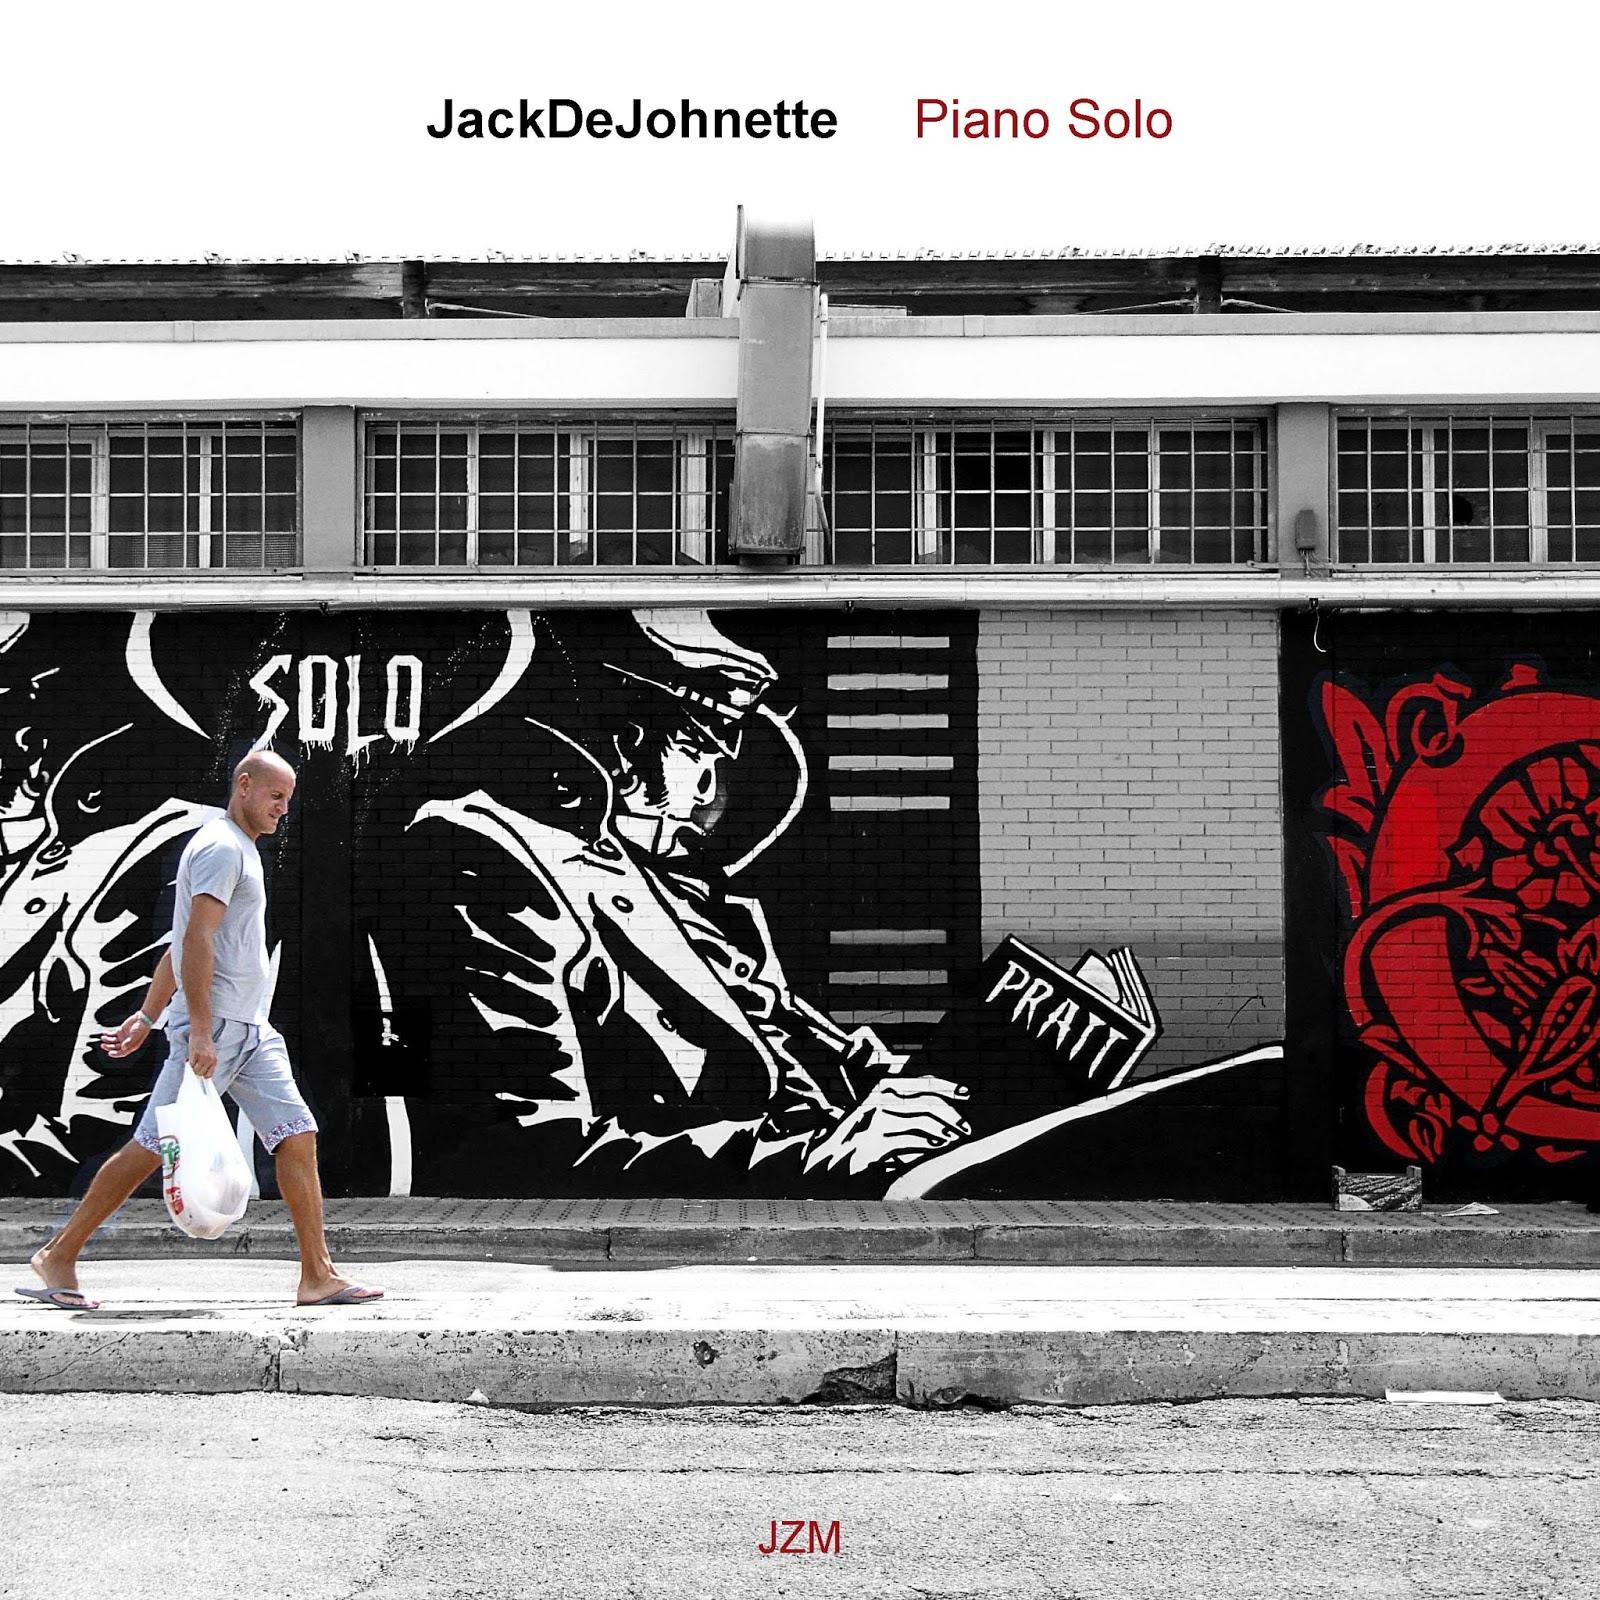 jacking solo